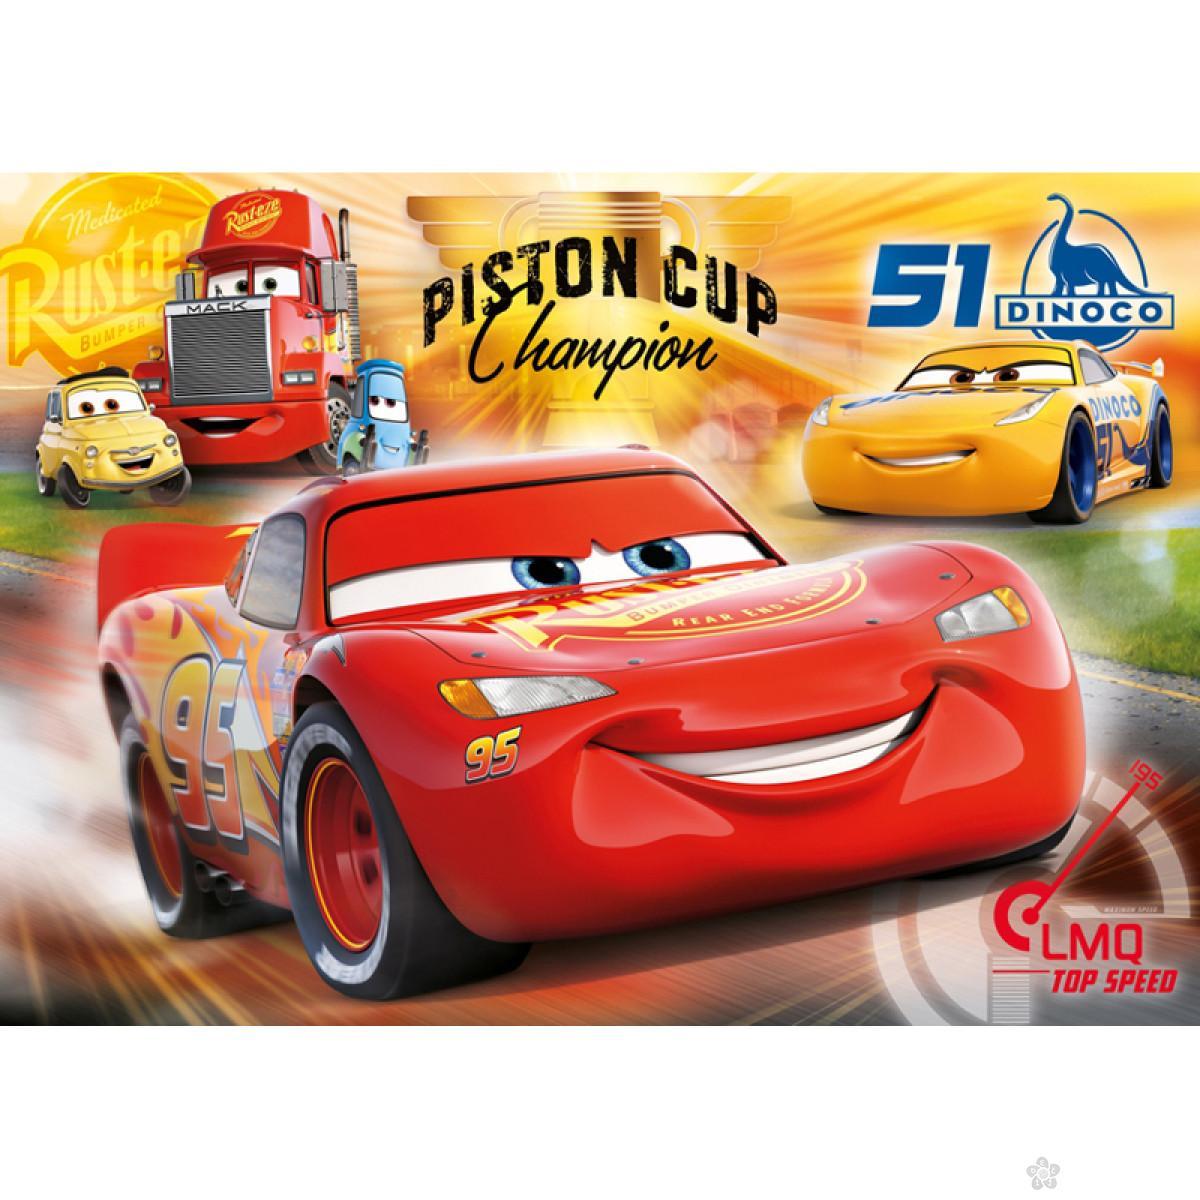 Puzzle 60  Maxi Cars Clementoni, 26424